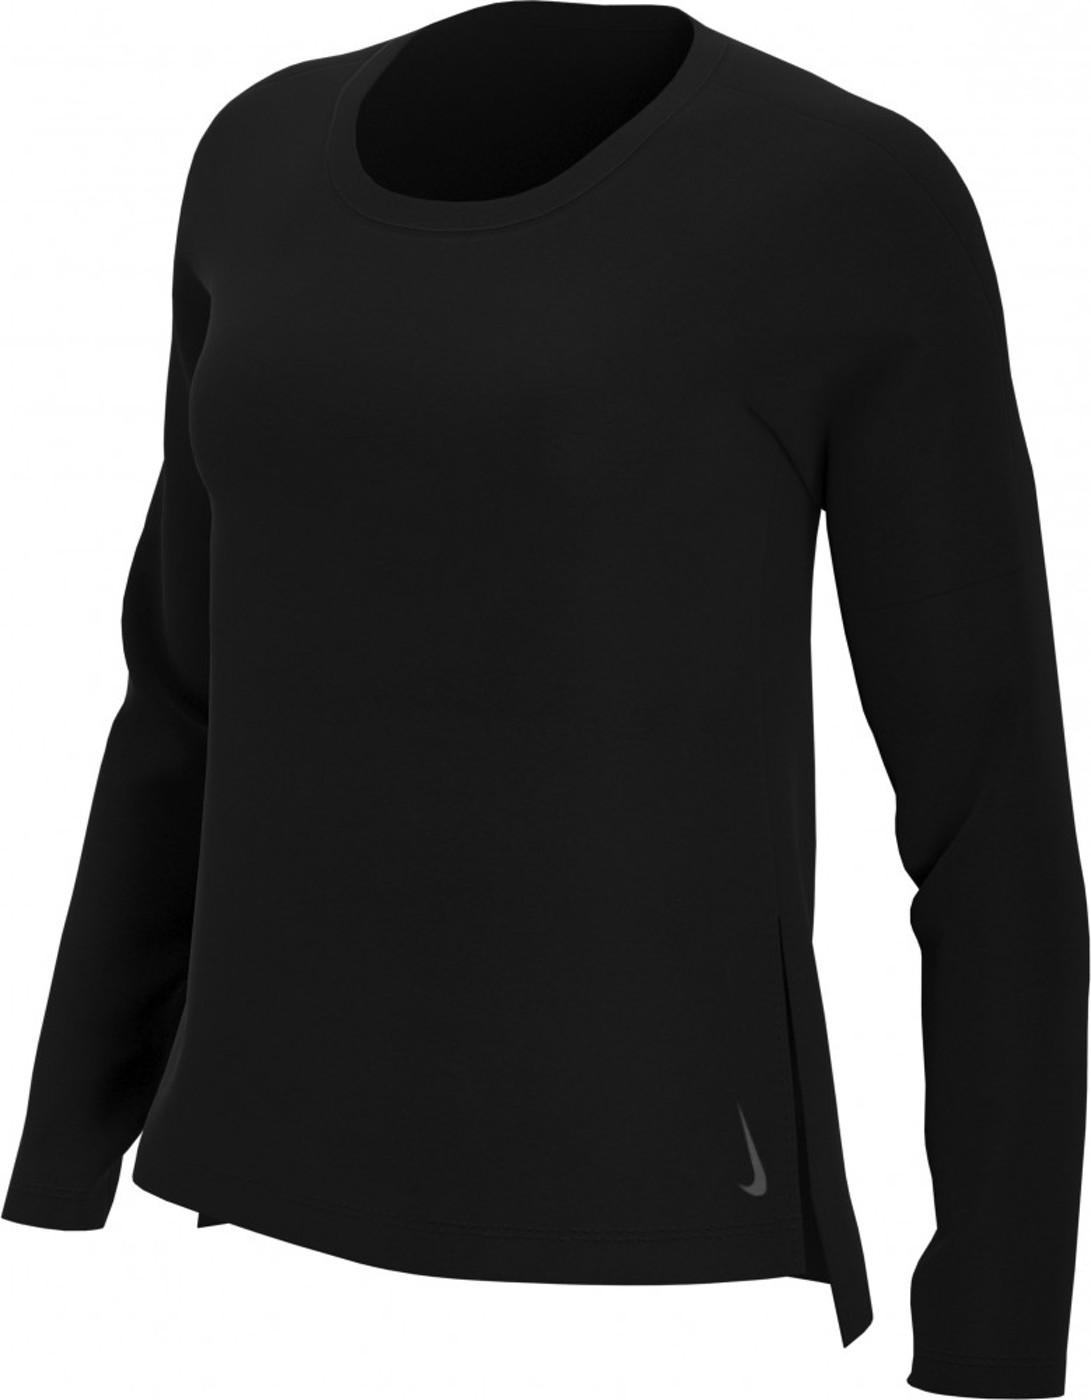 Nike Dri-FIT Yoga Long - Damen